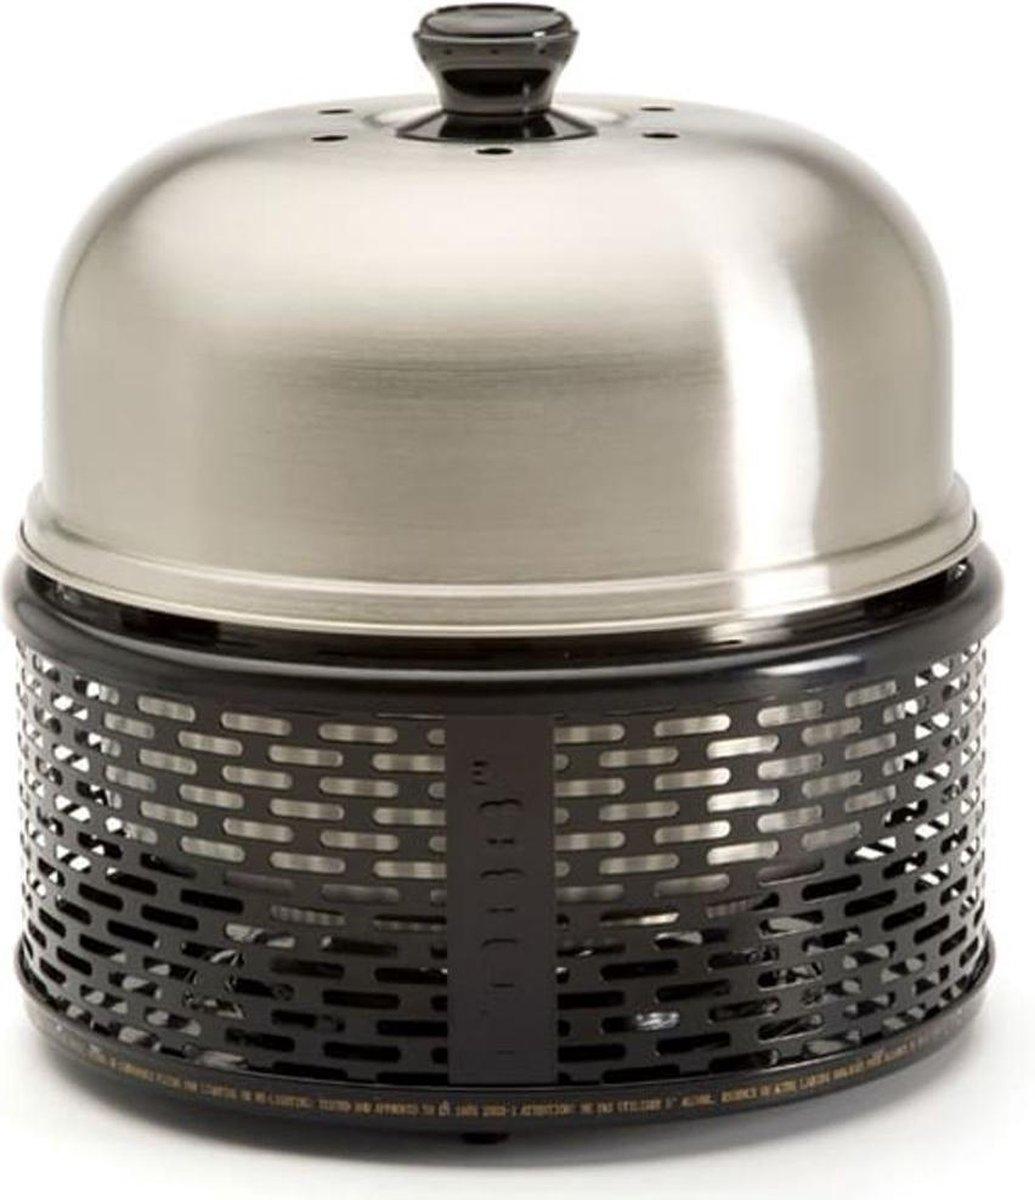 Cobb Pro Houtskool Barbecue - Grilloppervlak Ø 32 cm - Smoker Barbecue - Zwart